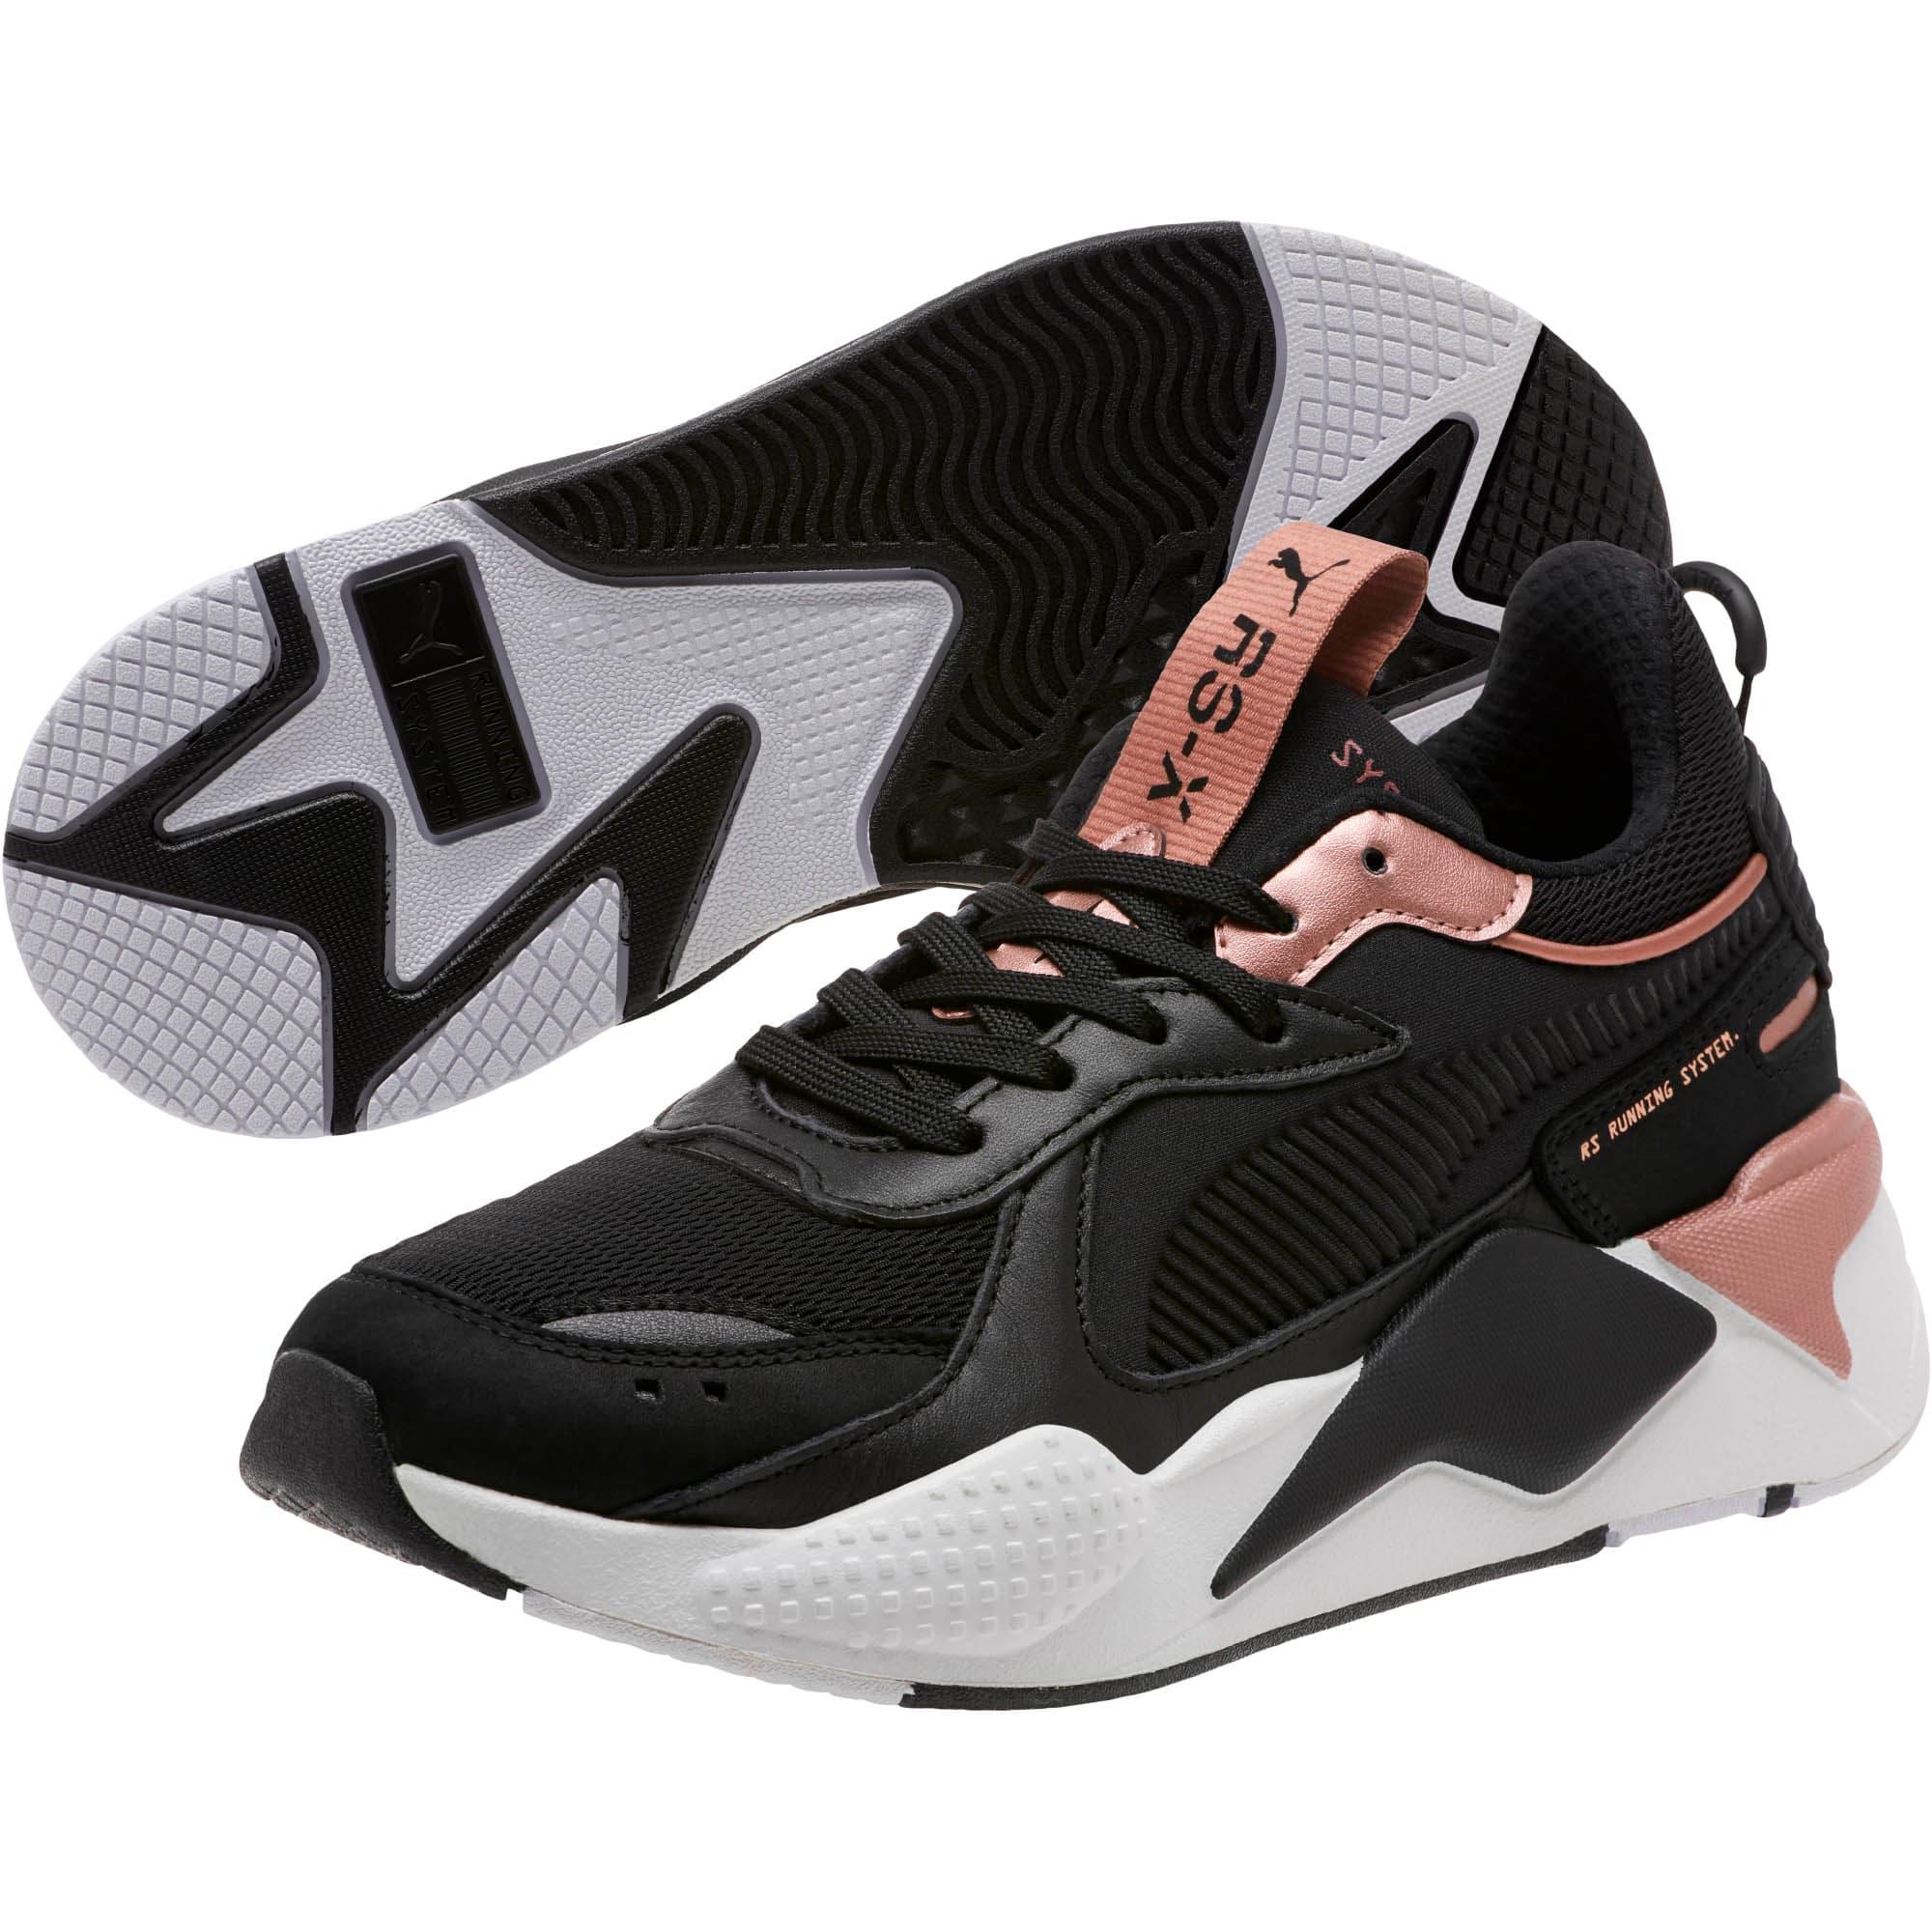 RS-X Trophy Women's Sneakers